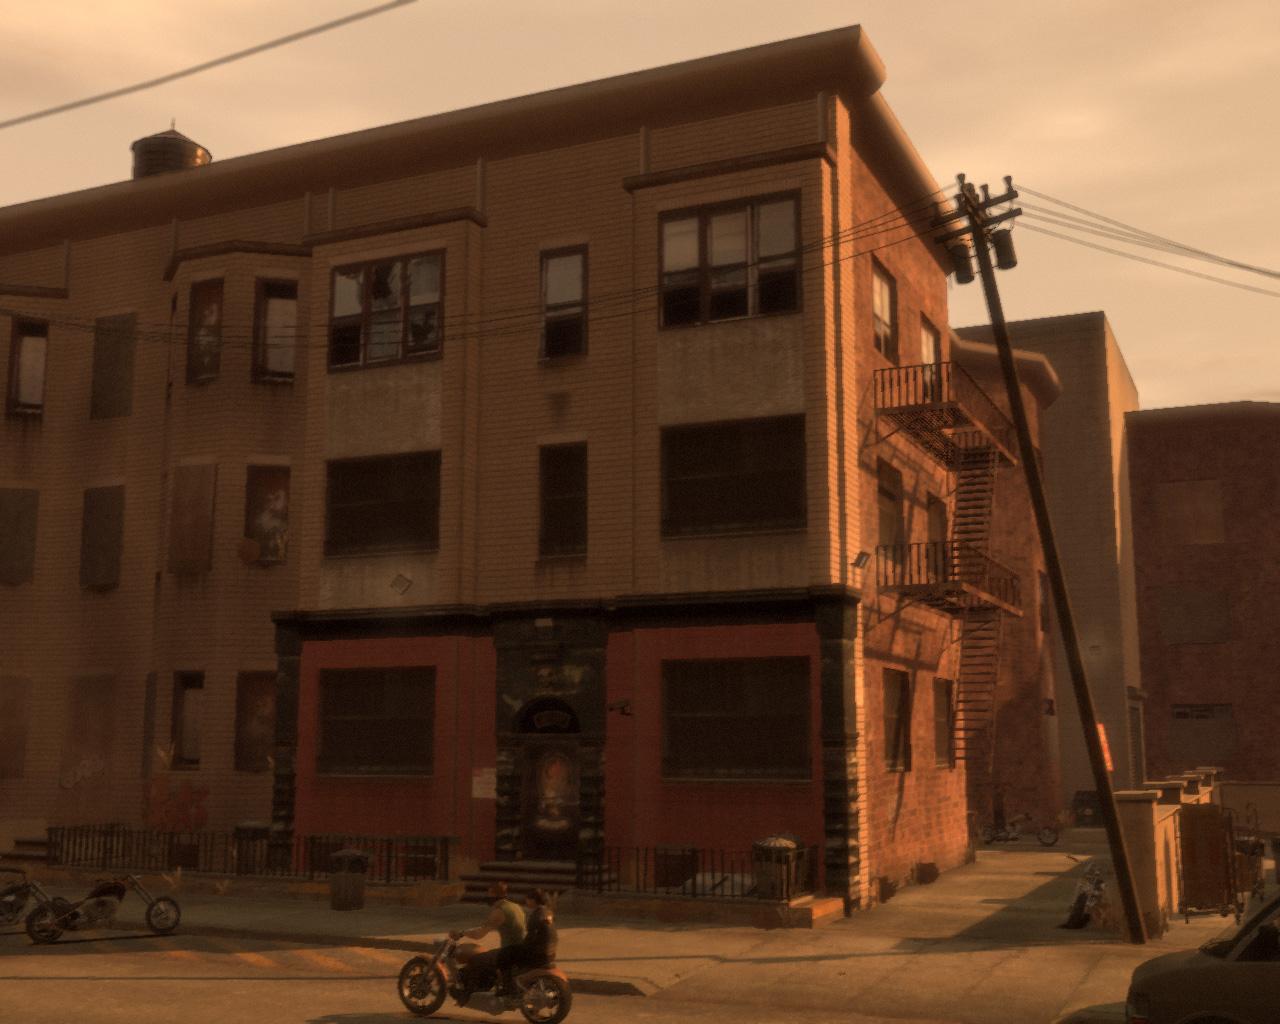 The Lost MC Clubhouse  GTA Wiki  FANDOM powered by Wikia